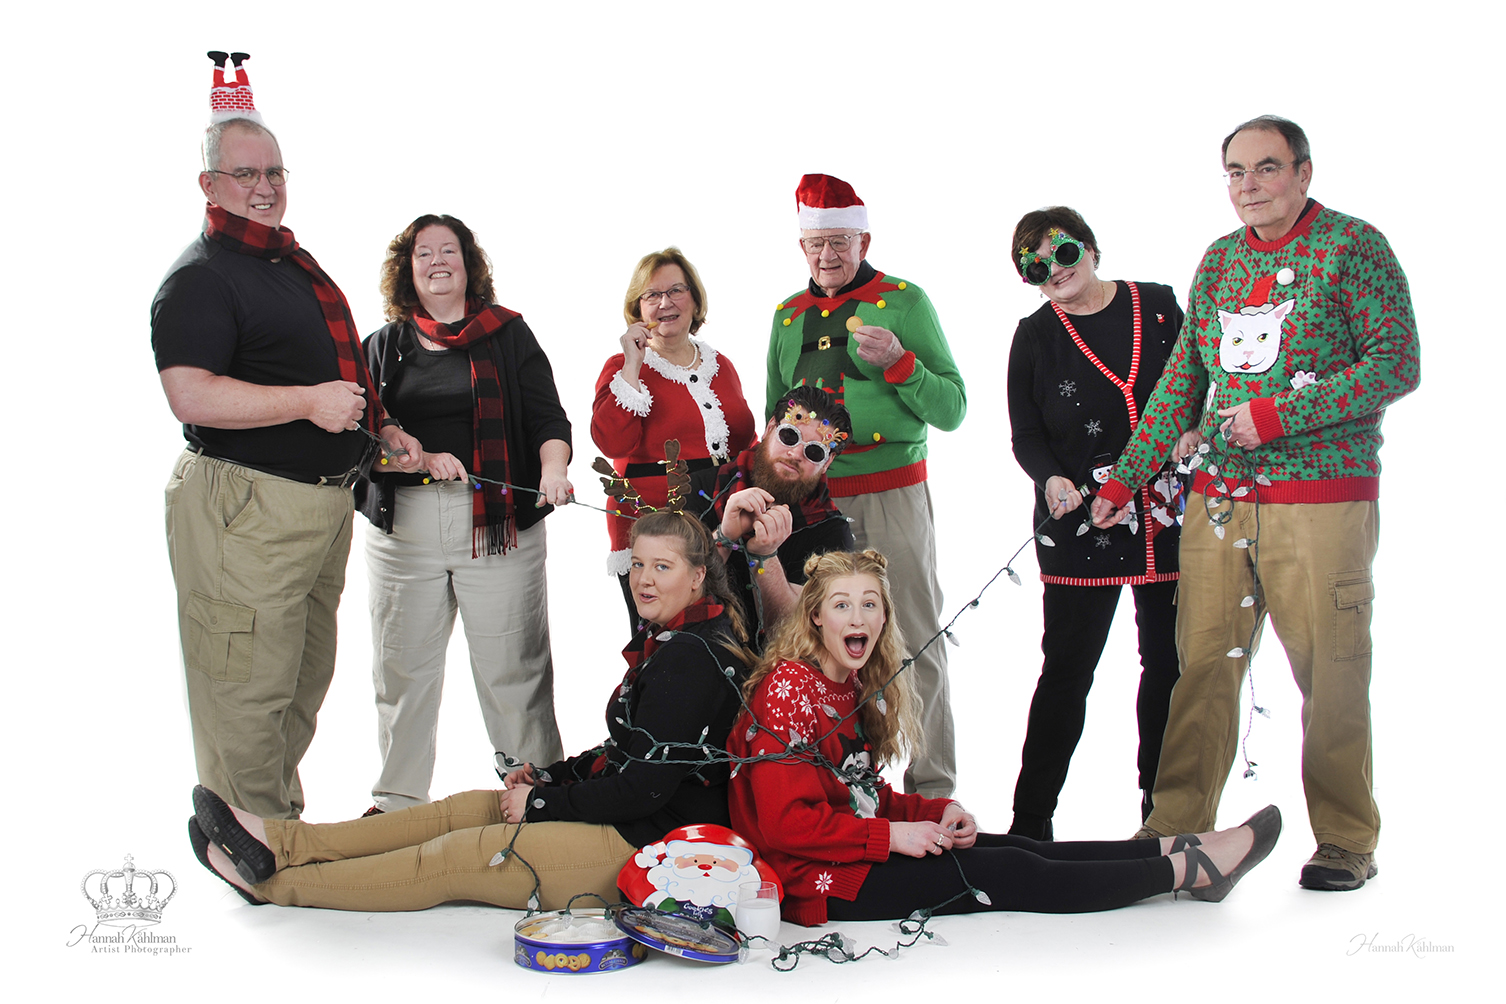 Fun_creative_Christmas_family_photo_in_s